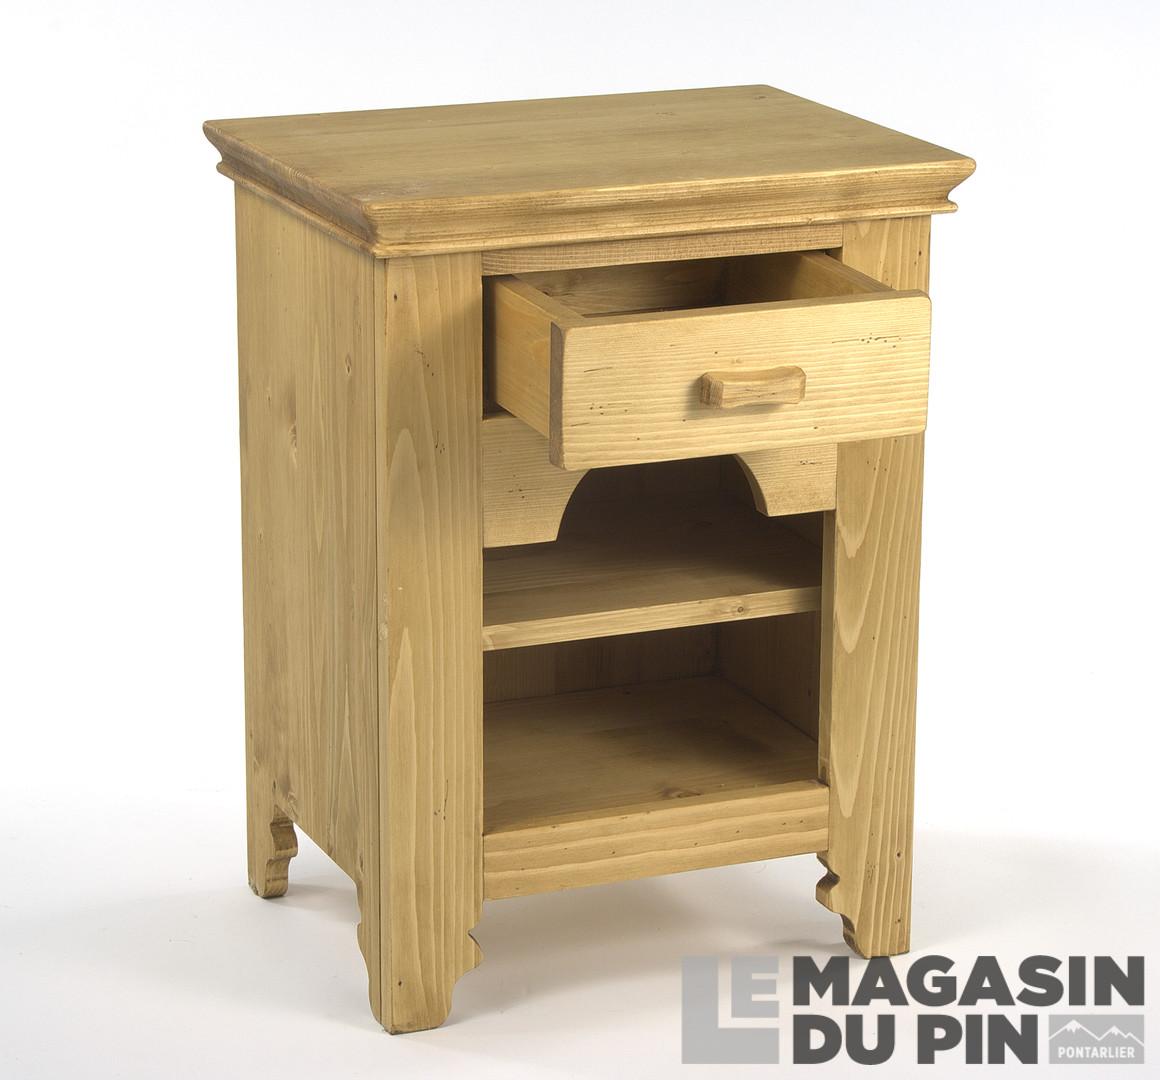 chevet 1 tiroir 1 niche en pin massif tradition le magasin du pin. Black Bedroom Furniture Sets. Home Design Ideas